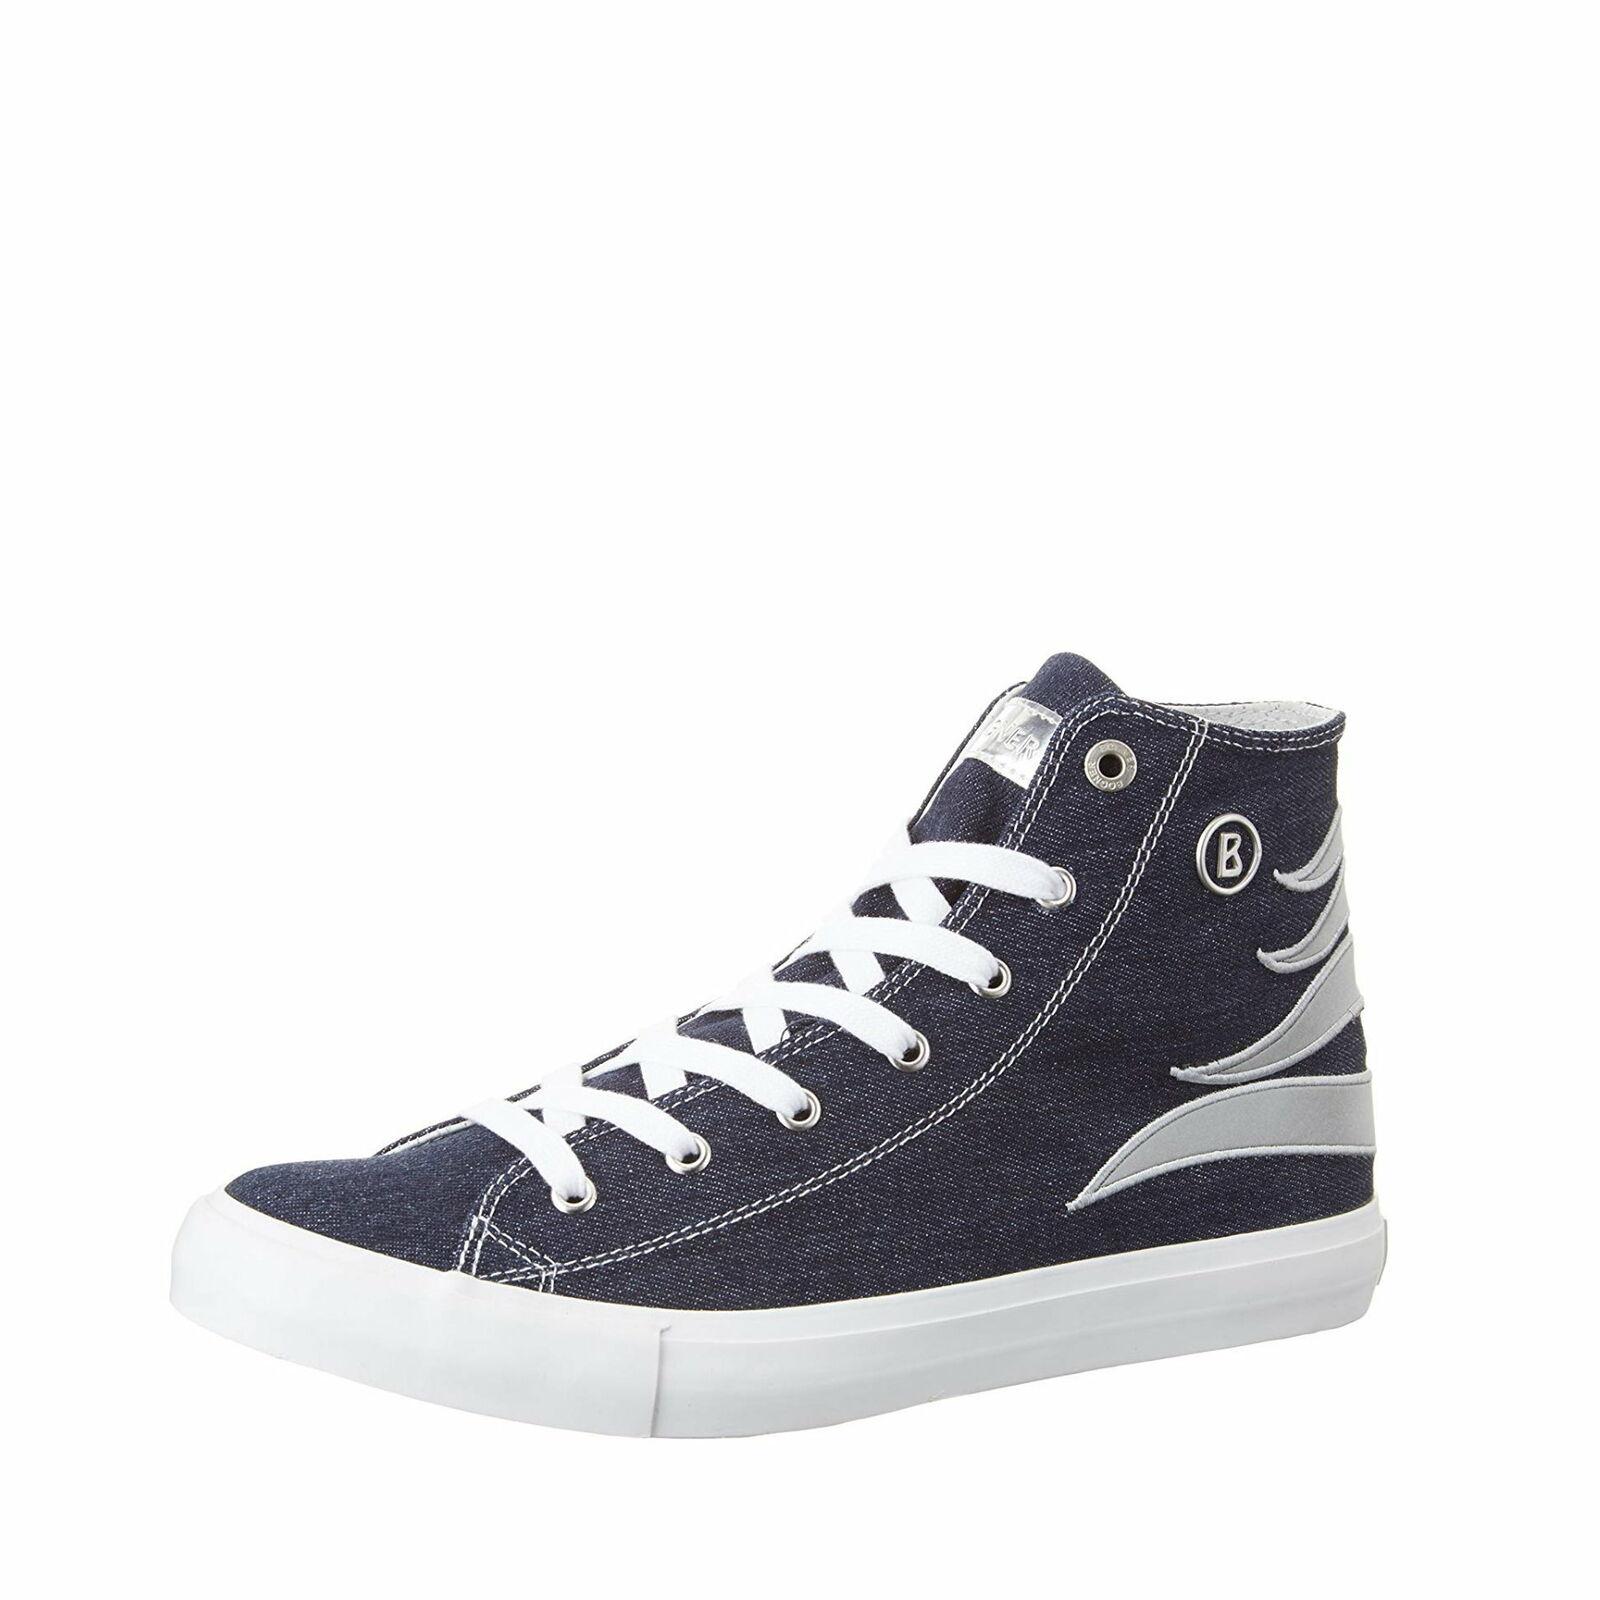 BOGNER New Jersey Lady 1 Turnschuhe Schuhe High-Top, Größe  36 EU -to- 38 EU   Blau